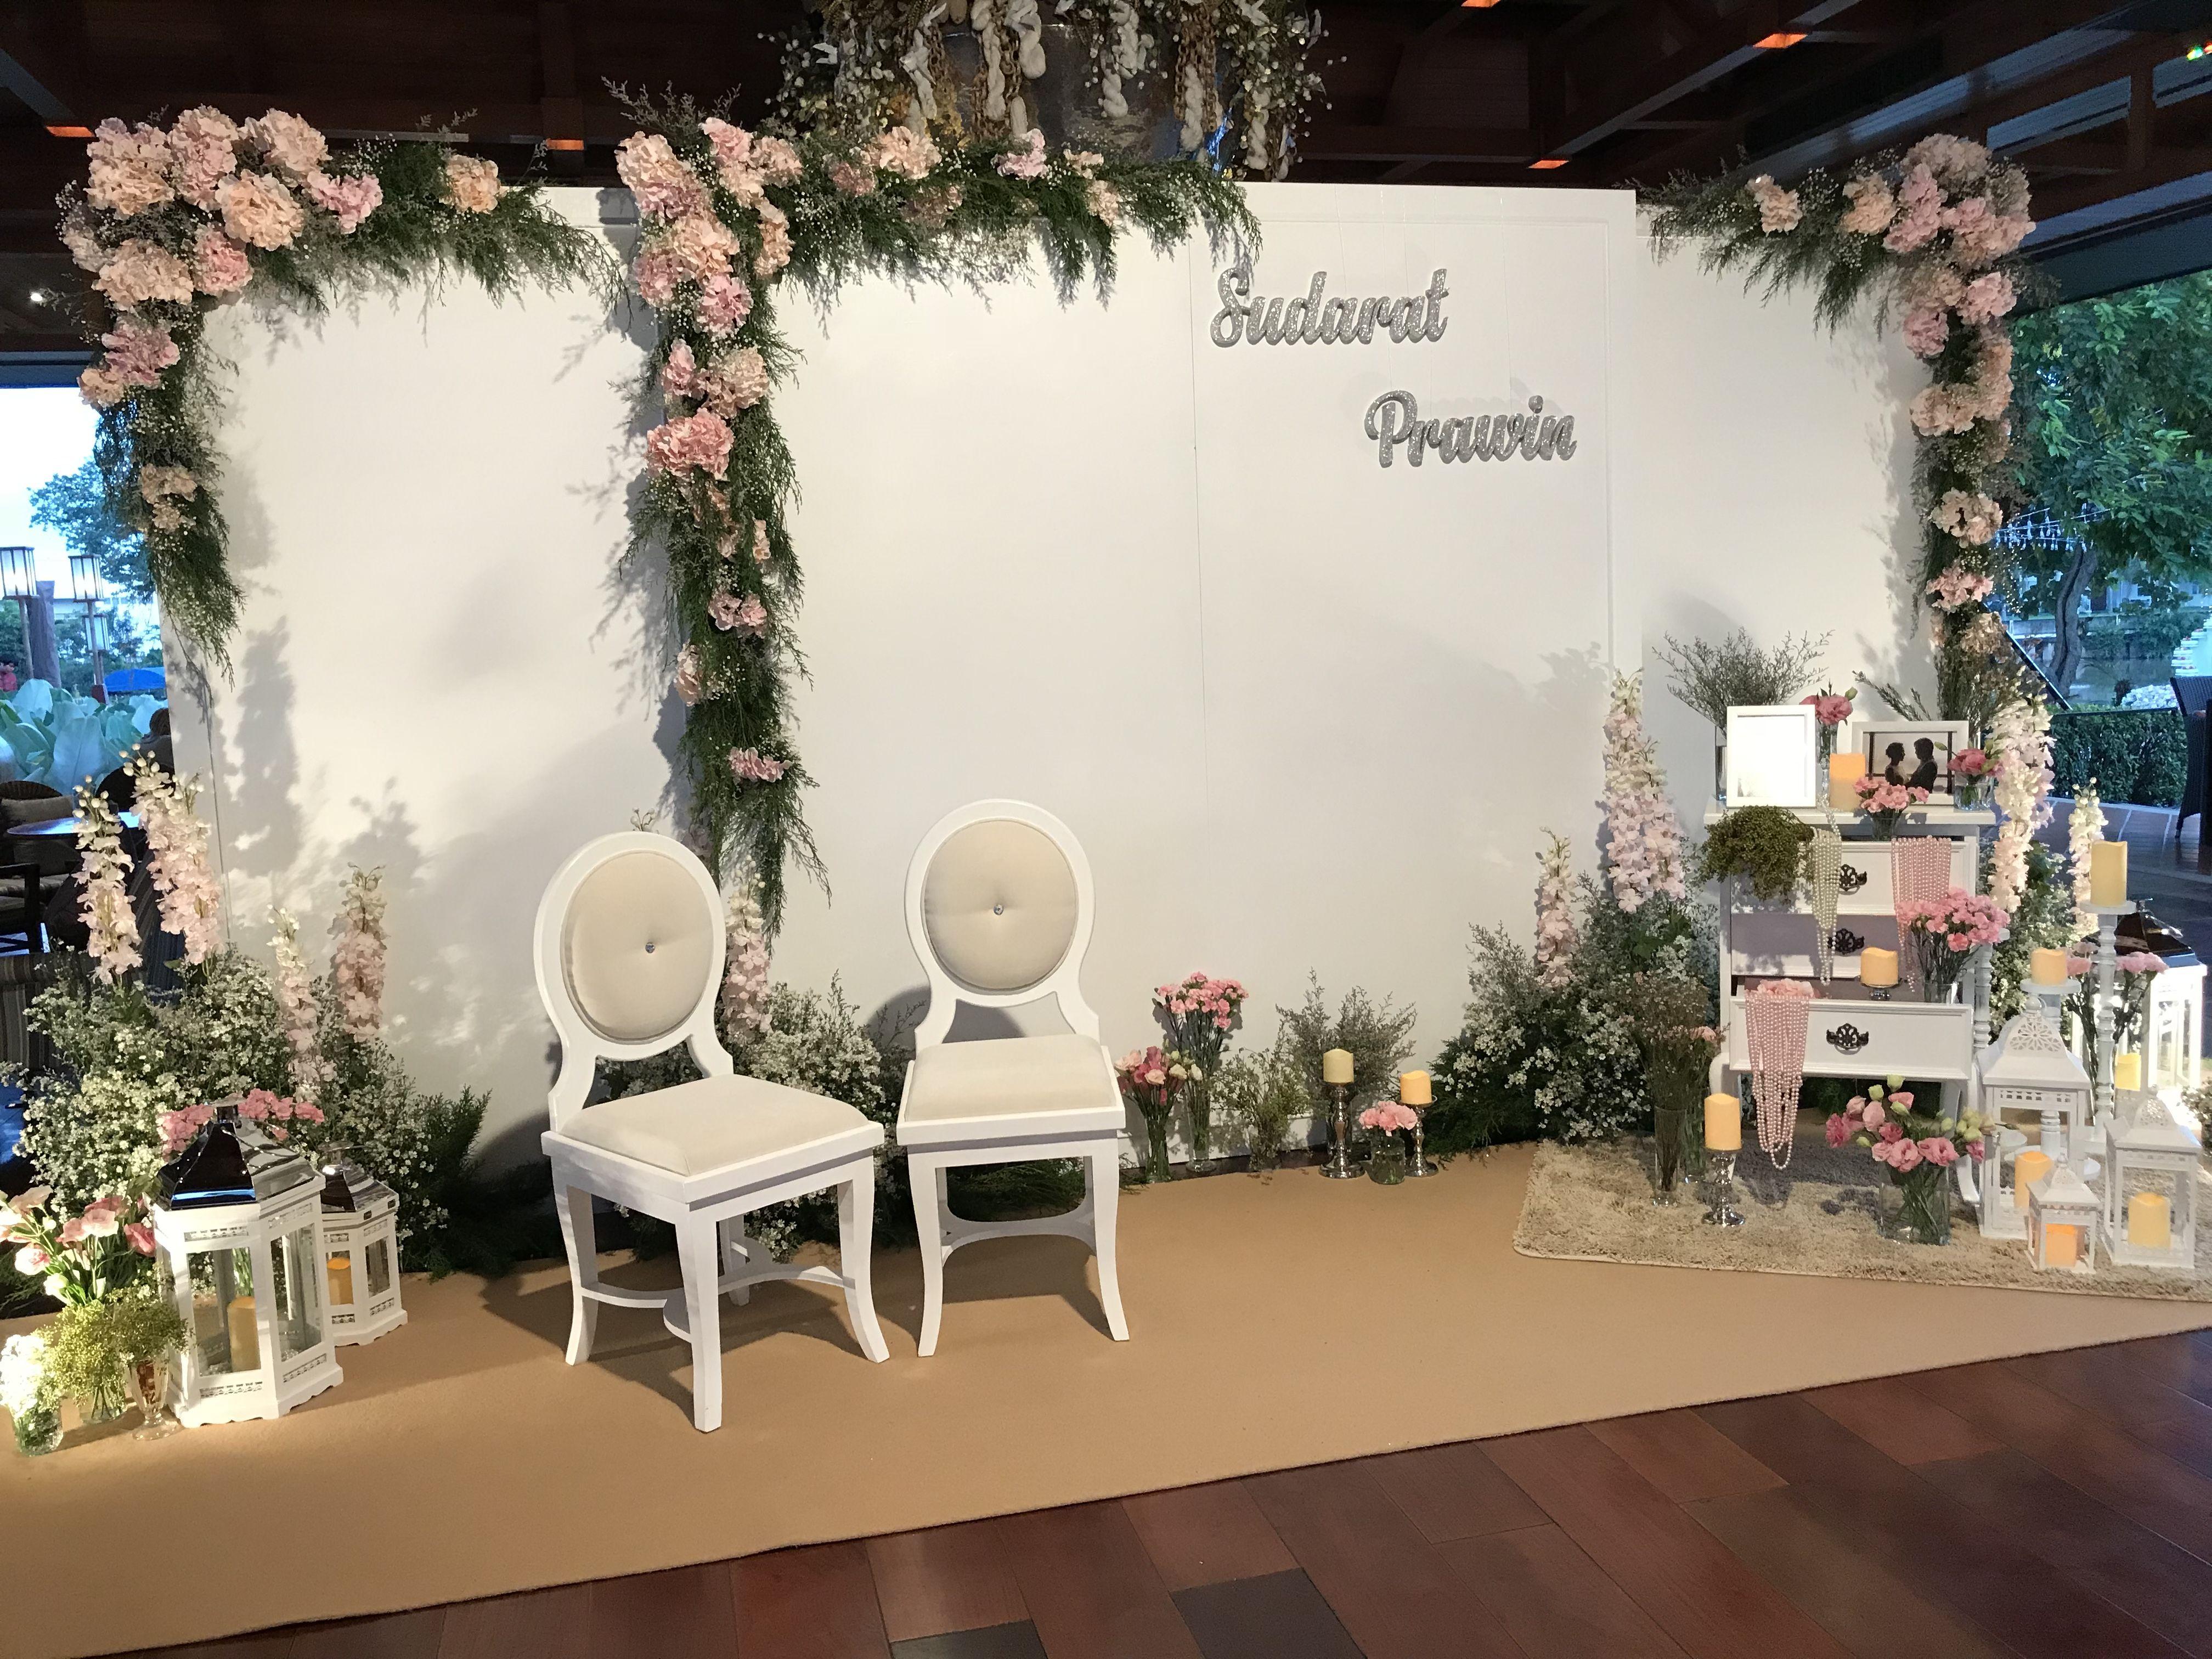 Jay D Event Stylist By Arncamugao Design Dekorasi Pernikahan Dekorasi Perkawinan Pernikahan